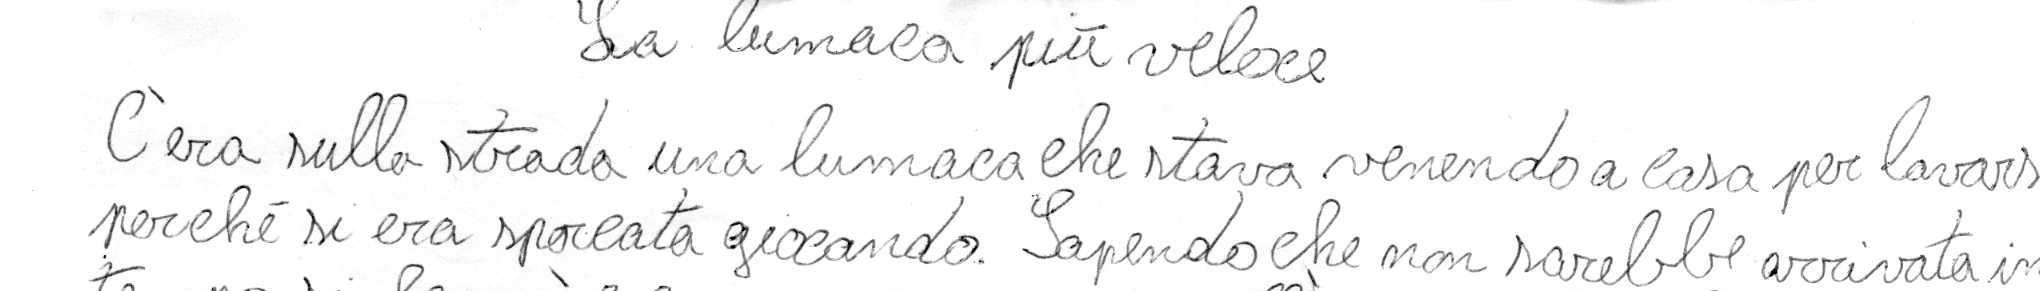 scrittura nr.3